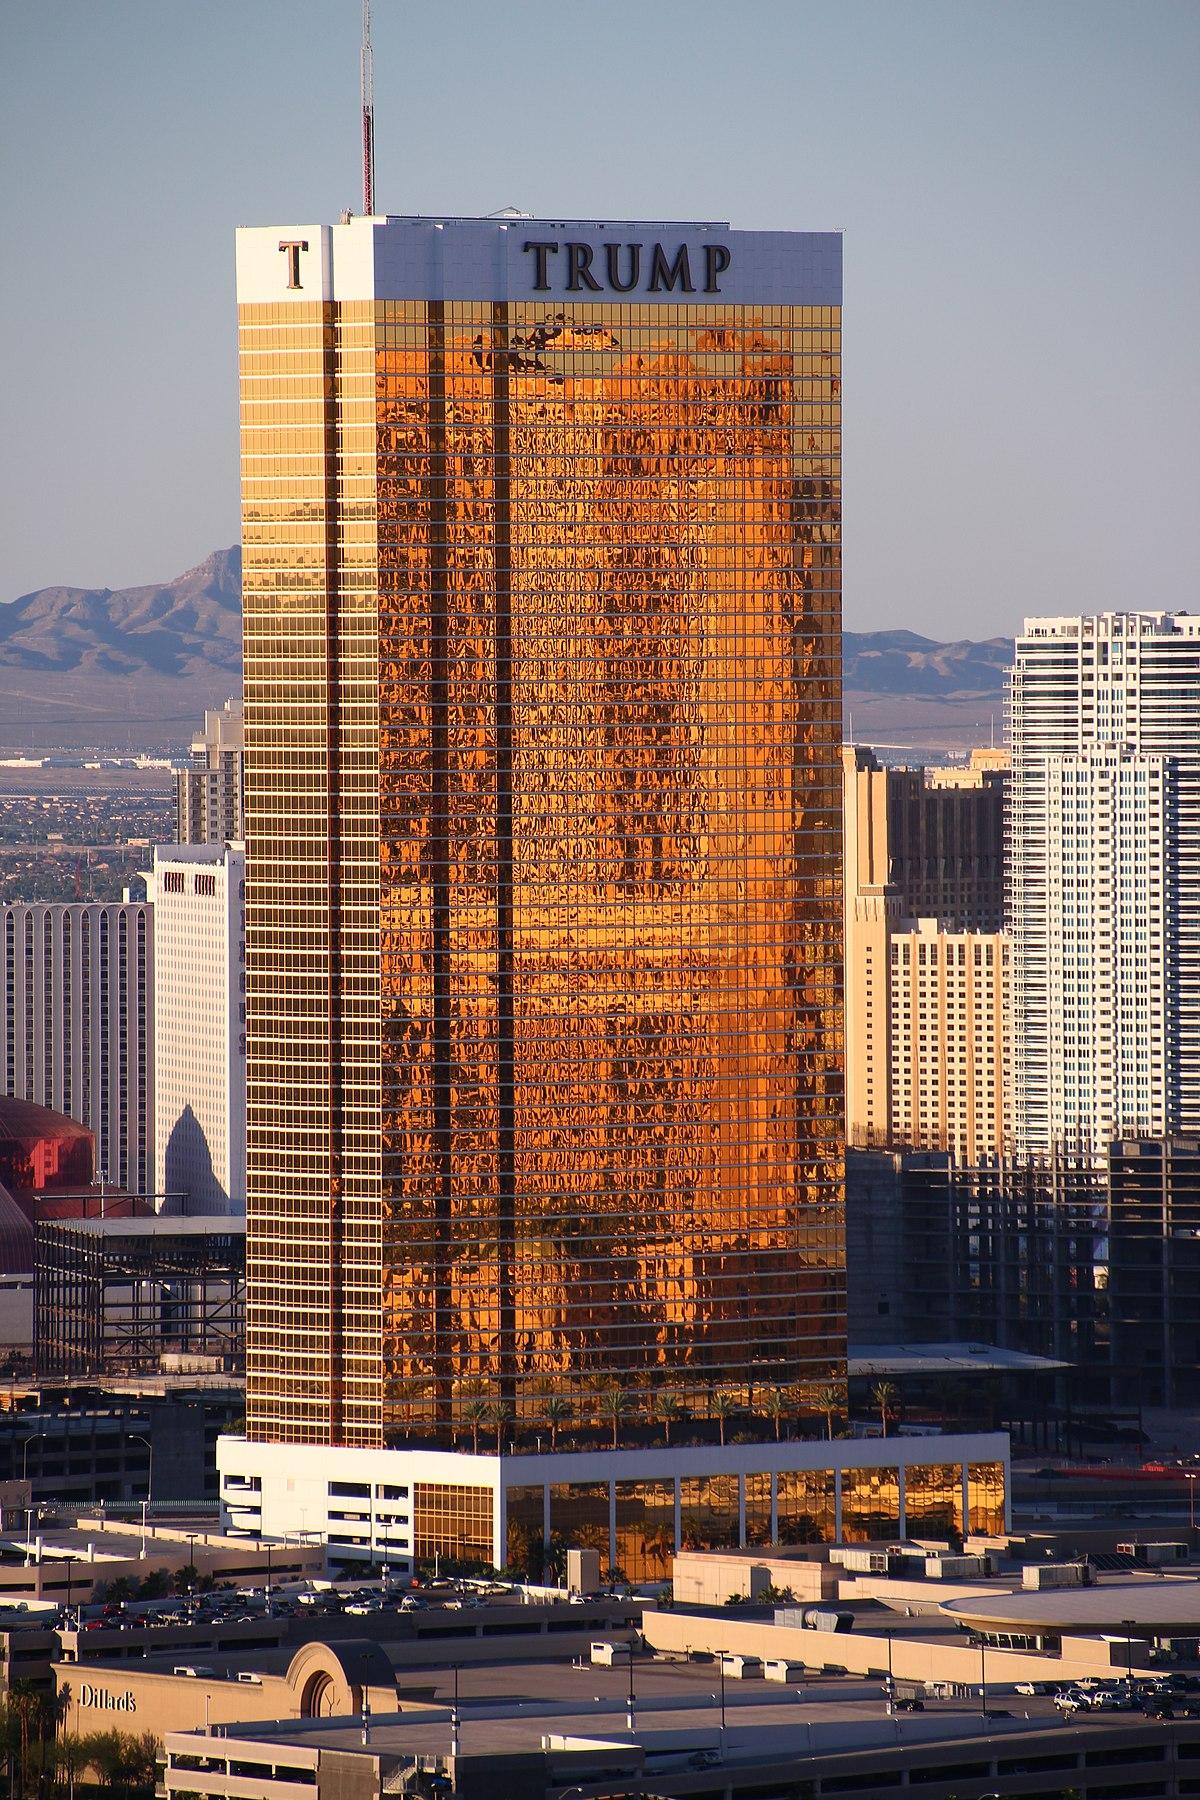 Las-Vegas-Trump-Hotel-8480.jpg